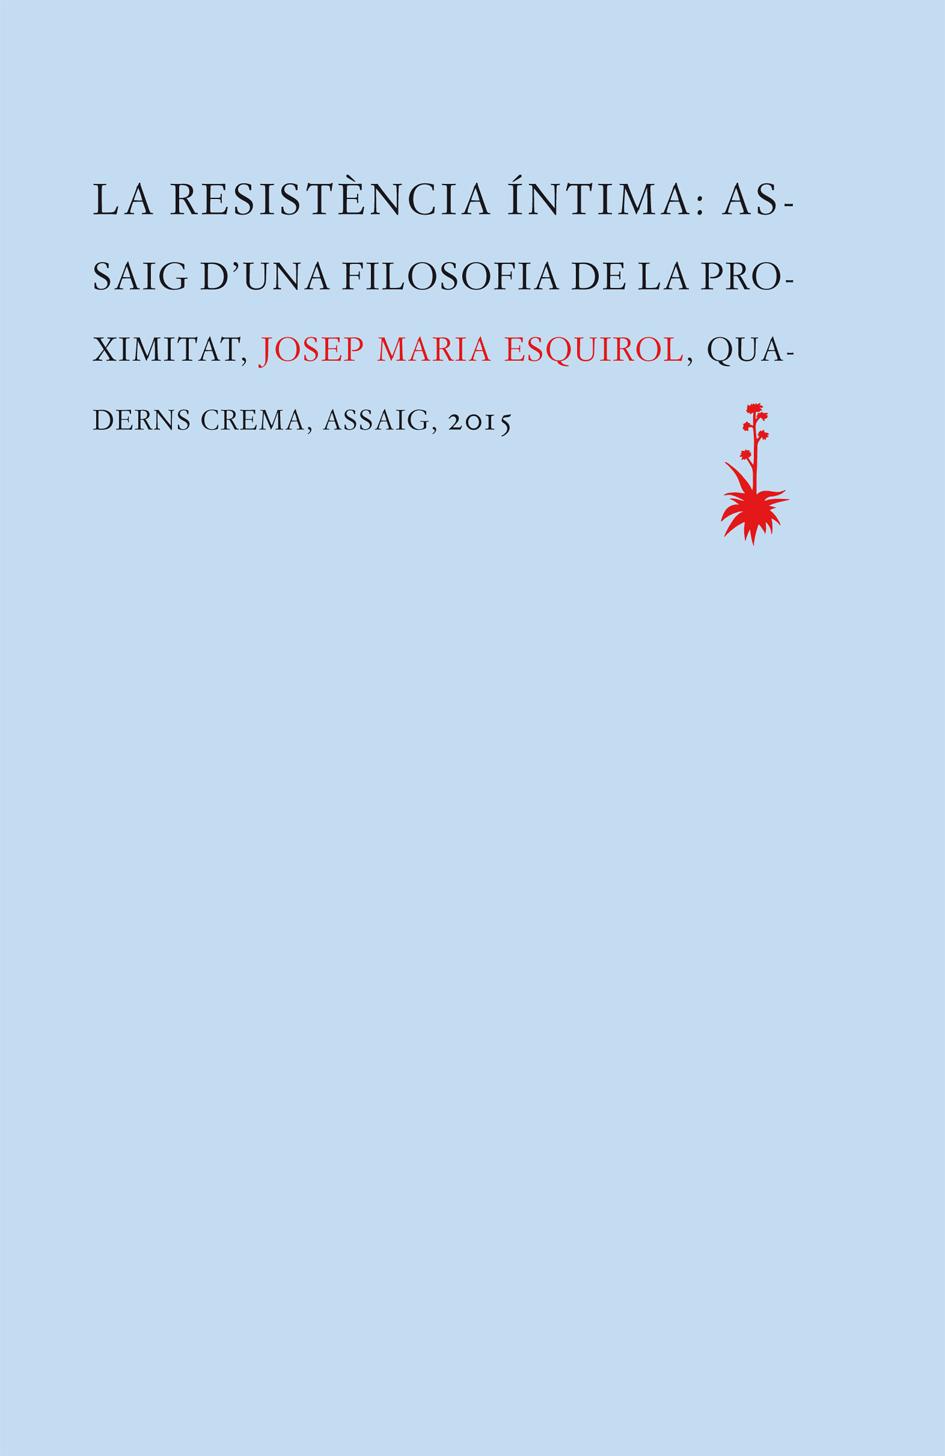 La resistència íntima, de Josep Maria Esquirol